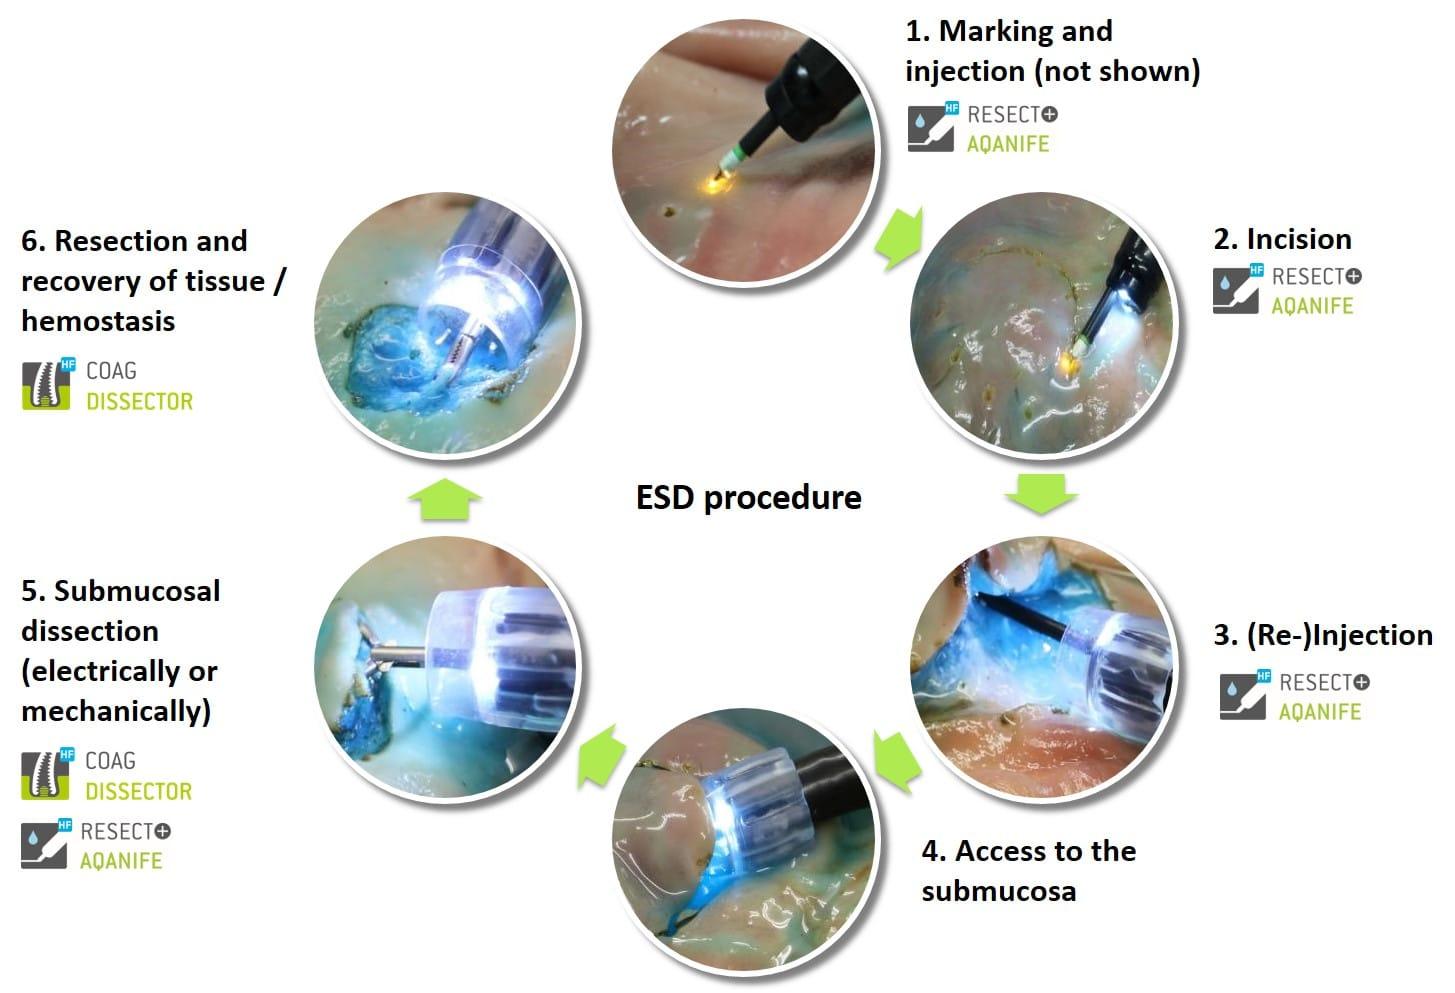 Aqanife Ovesco Endoscopy Ag